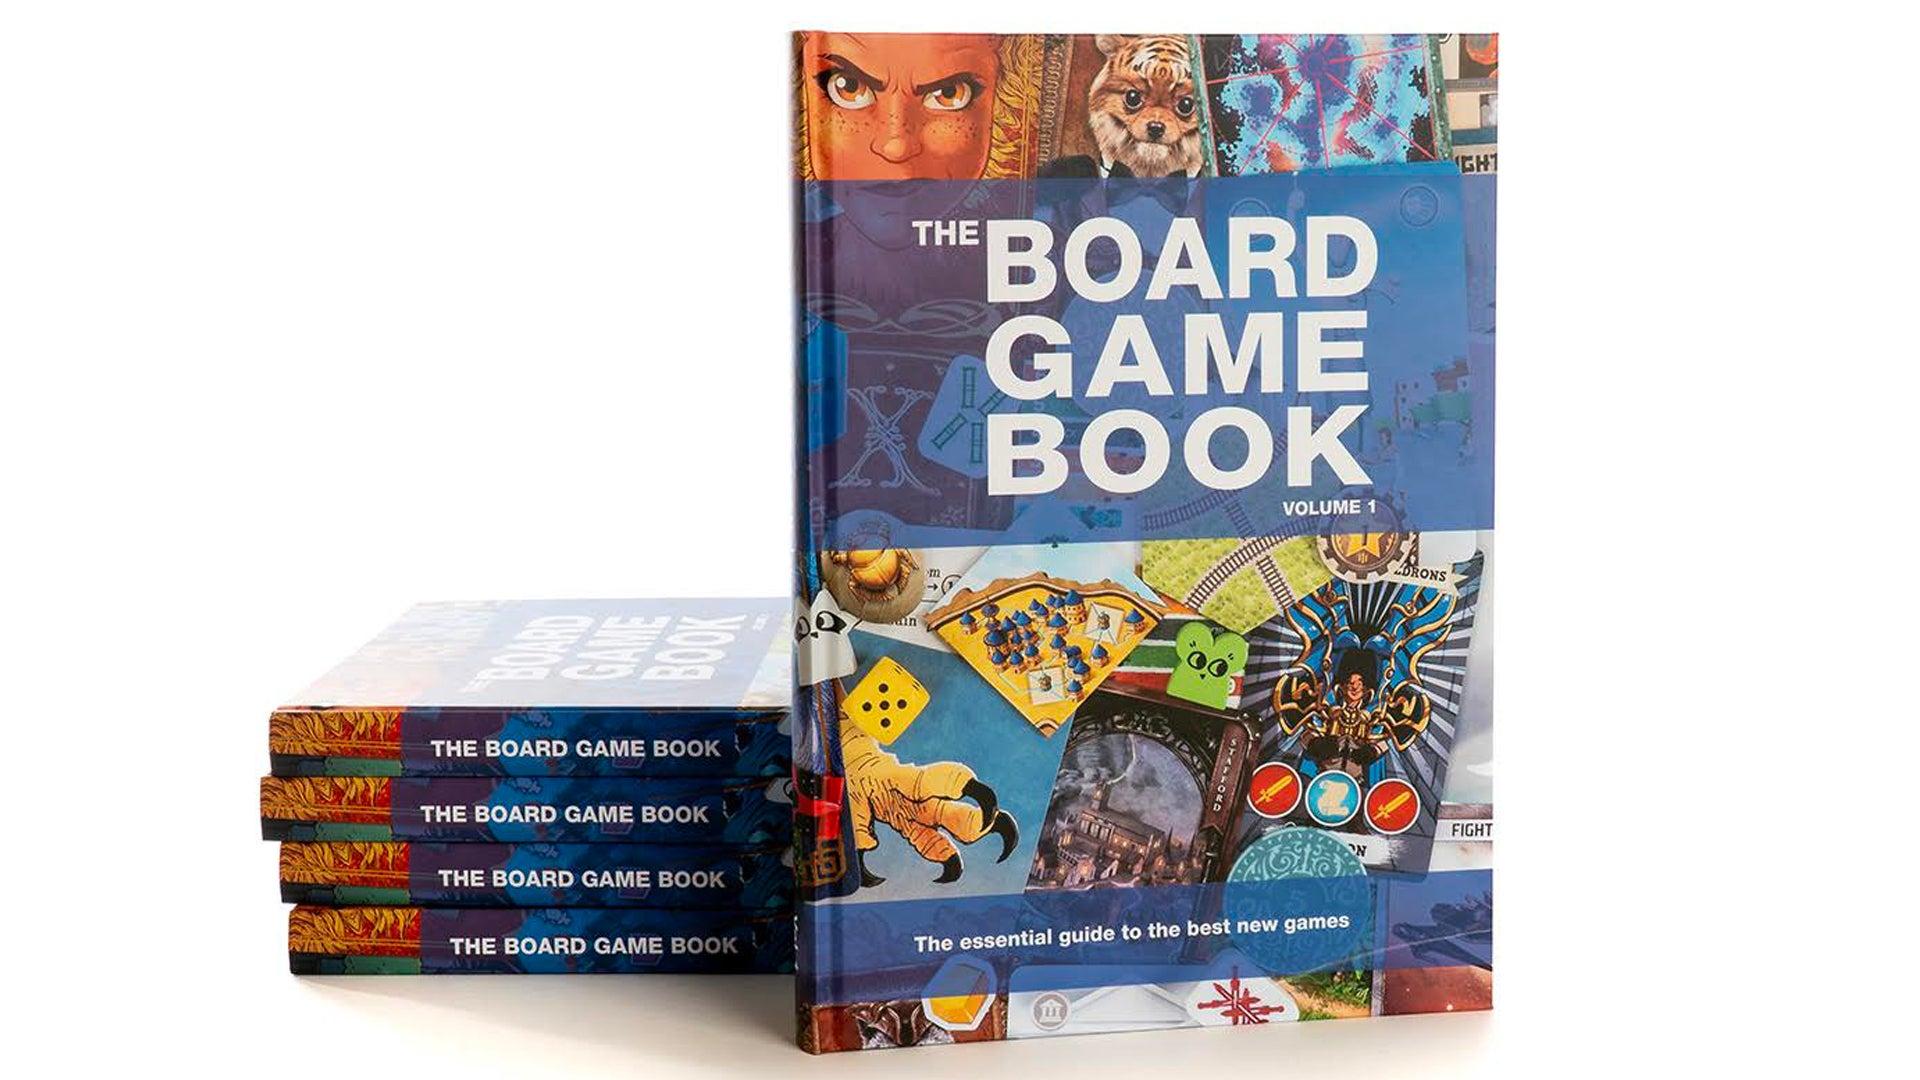 Board Game Book Volume 1 image